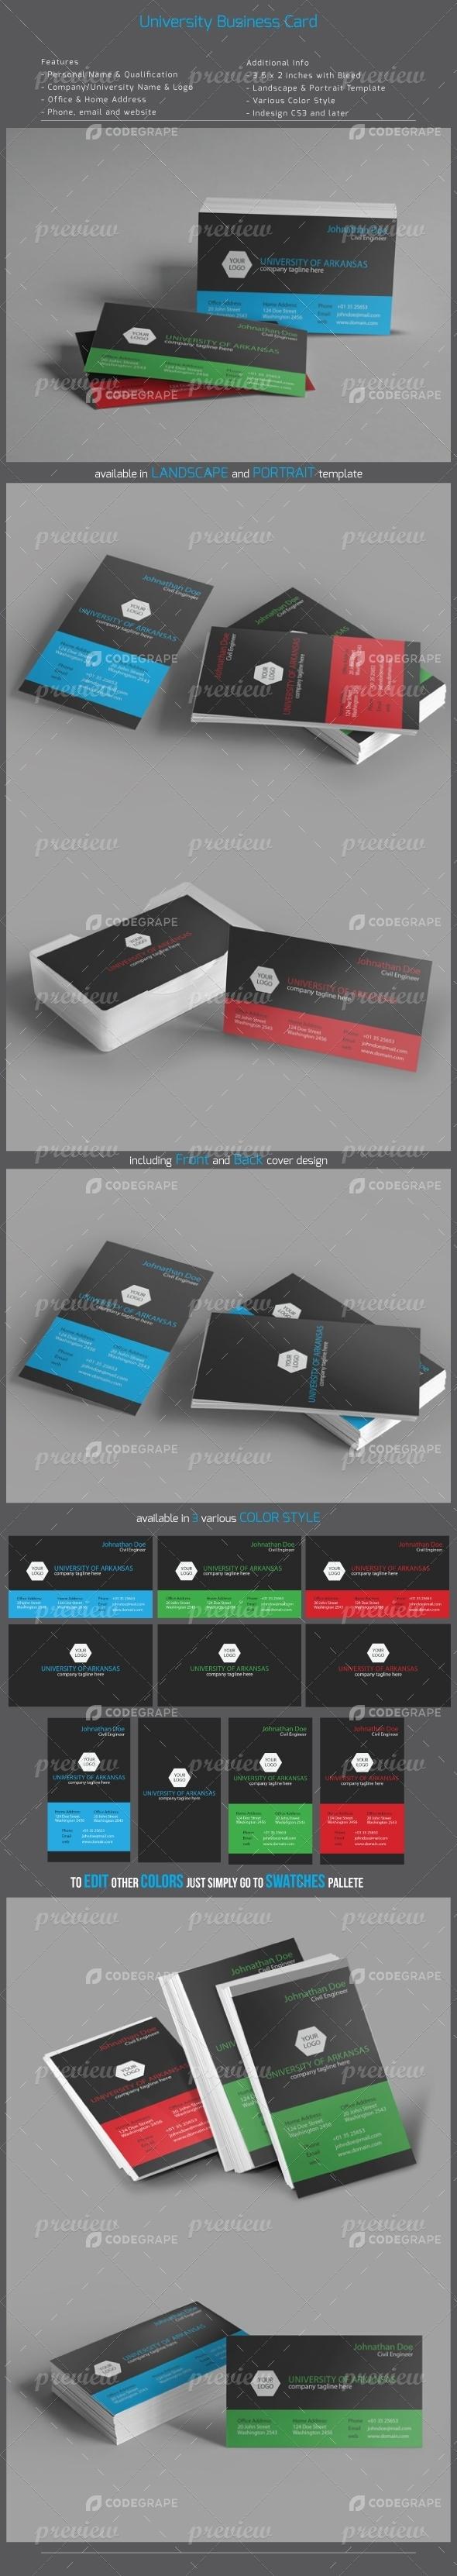 University Business Card